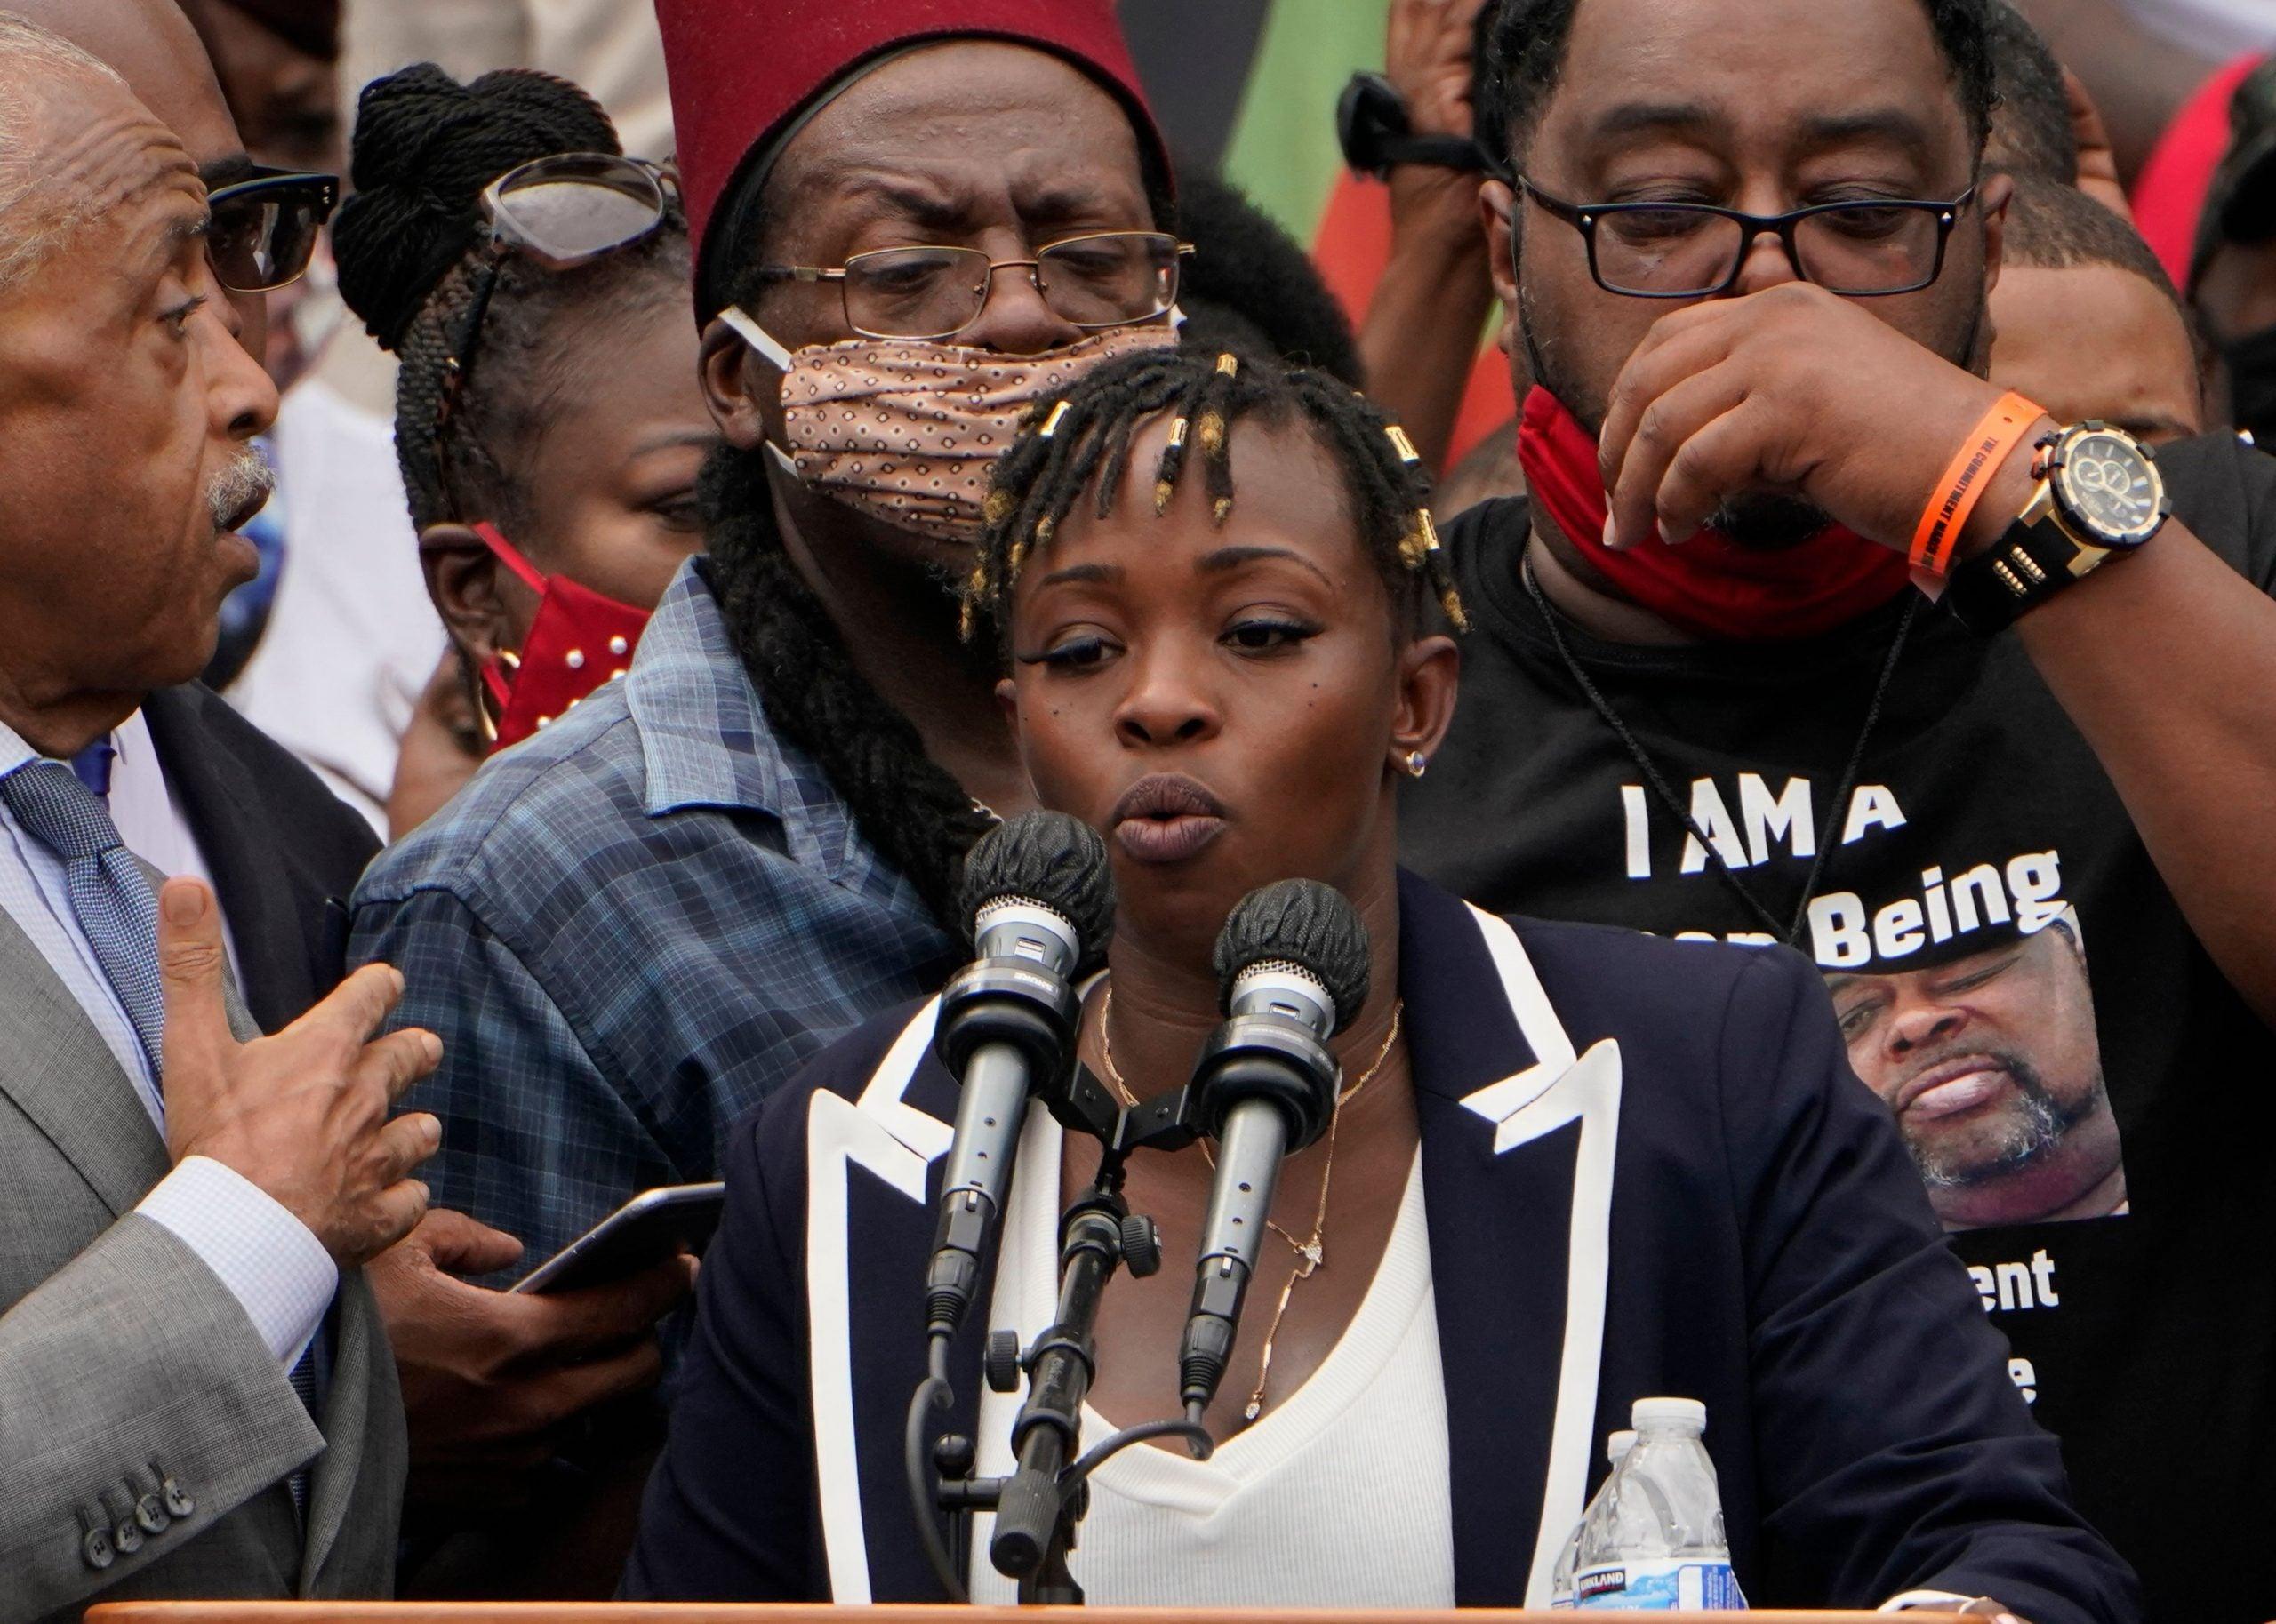 Jacob Blake's Sister During March On Washington: 'Black America, I Hold You Accountable'